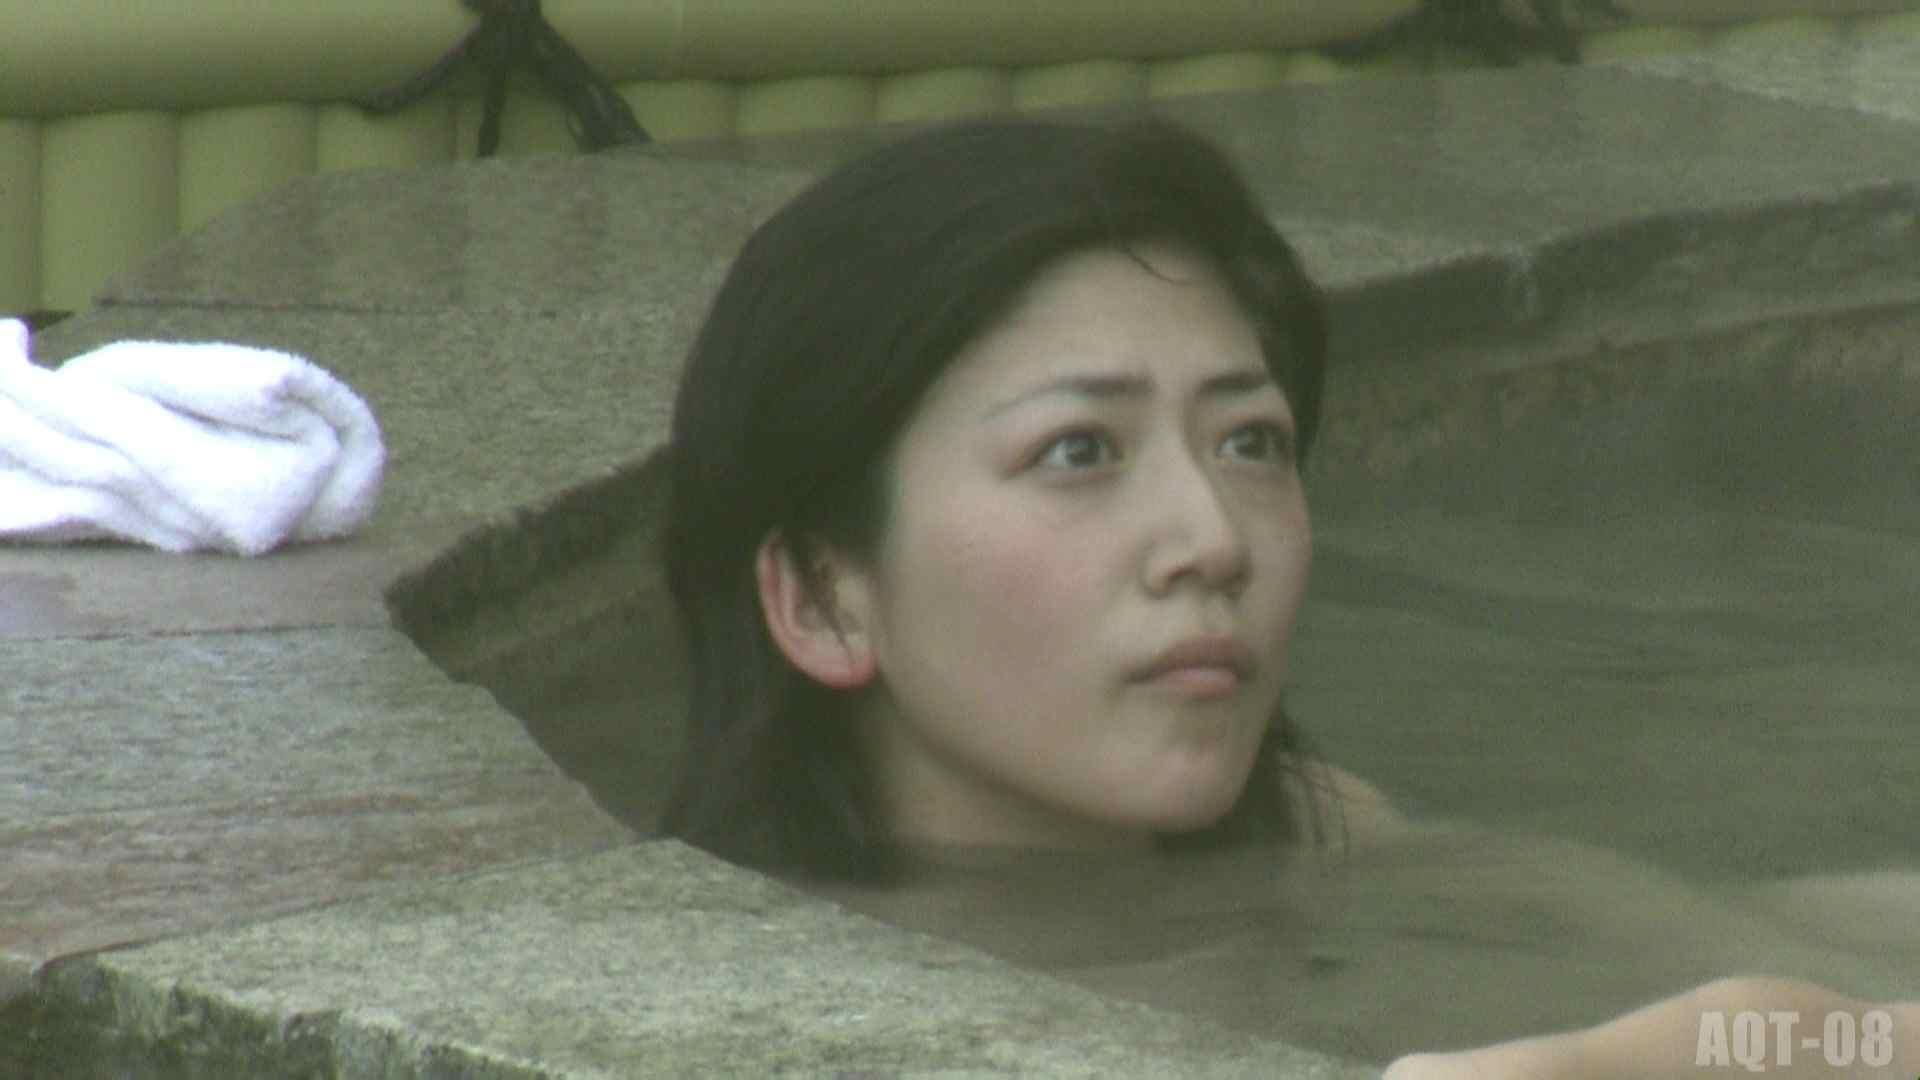 Aquaな露天風呂Vol.776 盗撮 | HなOL  60pic 14